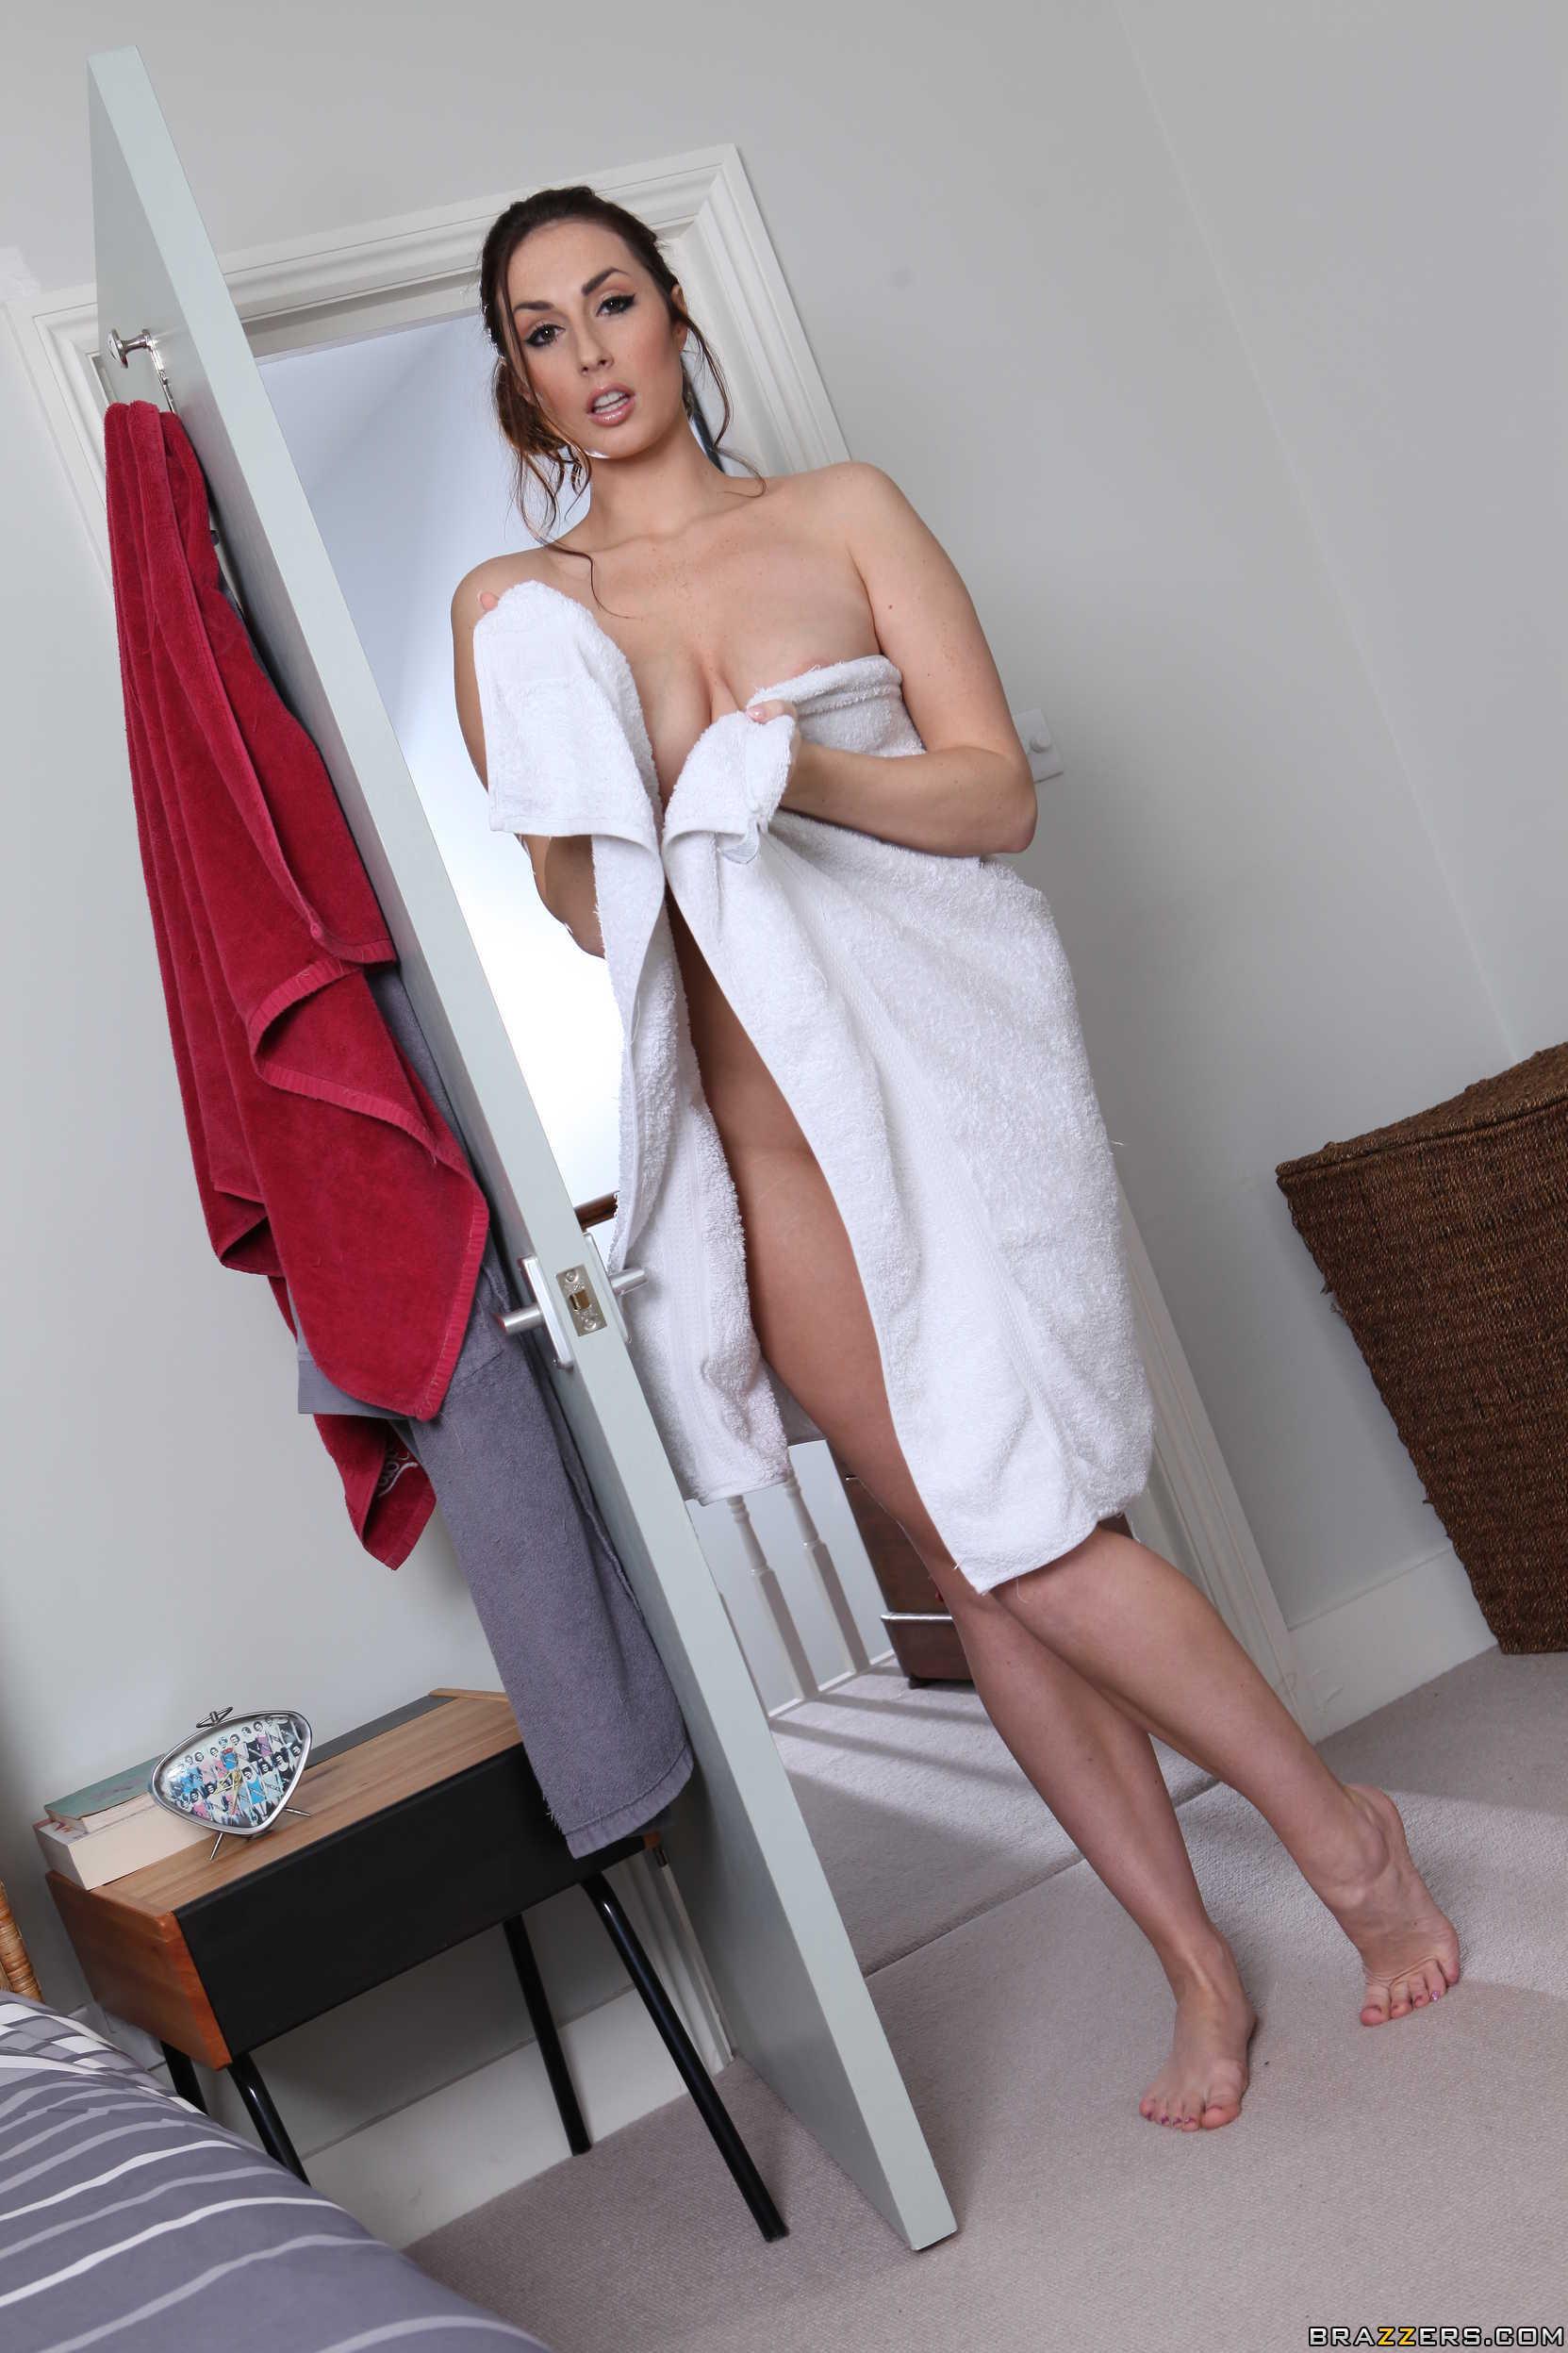 Paige turnah nude